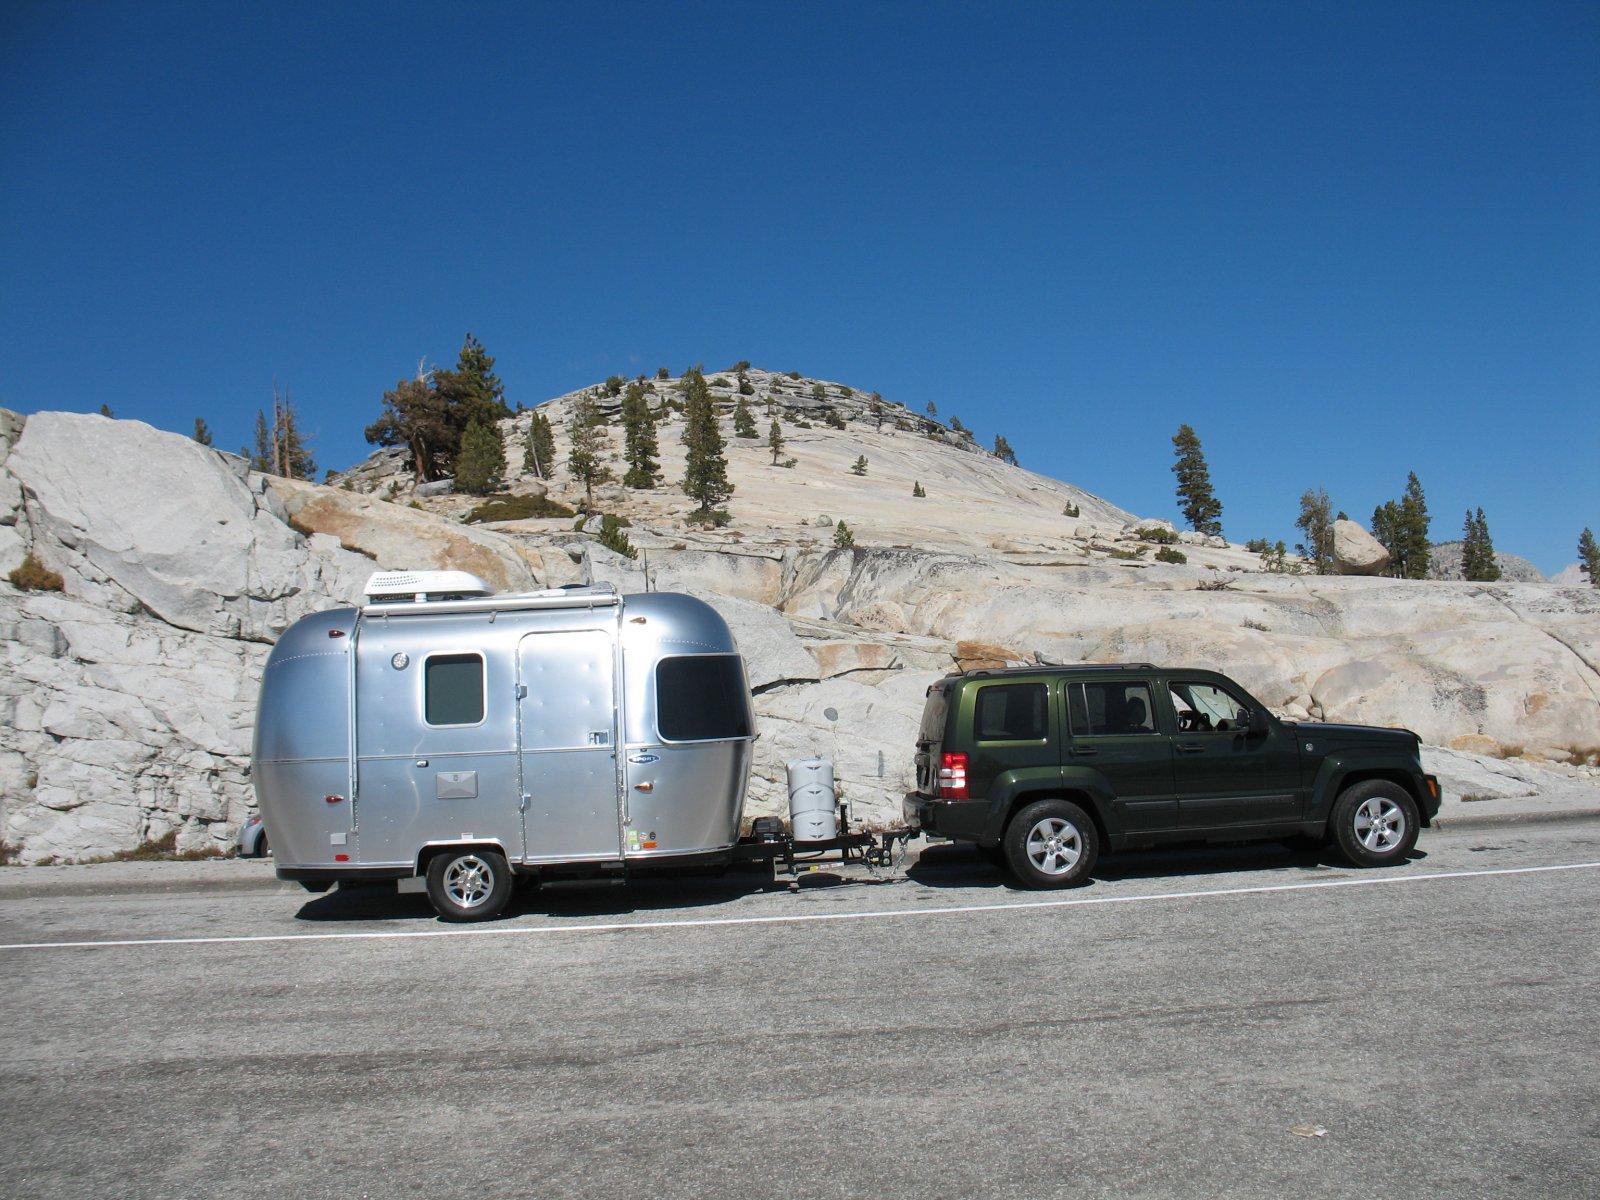 Click image for larger version  Name:Yosemite October 2012 098.jpg Views:63 Size:338.3 KB ID:171093